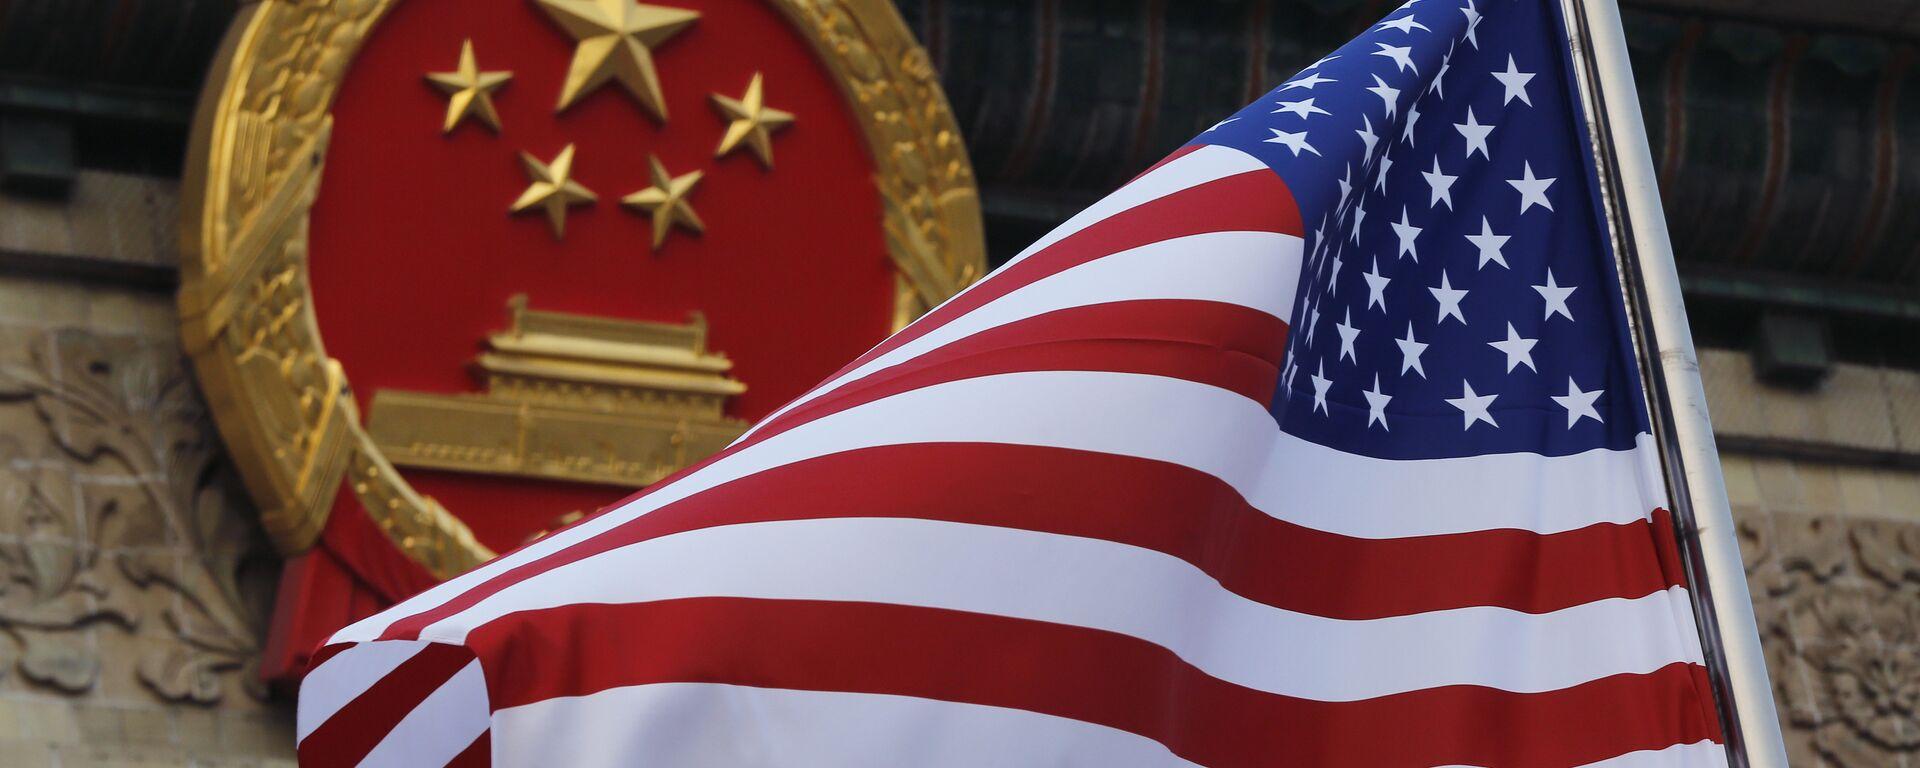 La bandera de EEUU y el emblema de China  - Sputnik Mundo, 1920, 14.05.2021